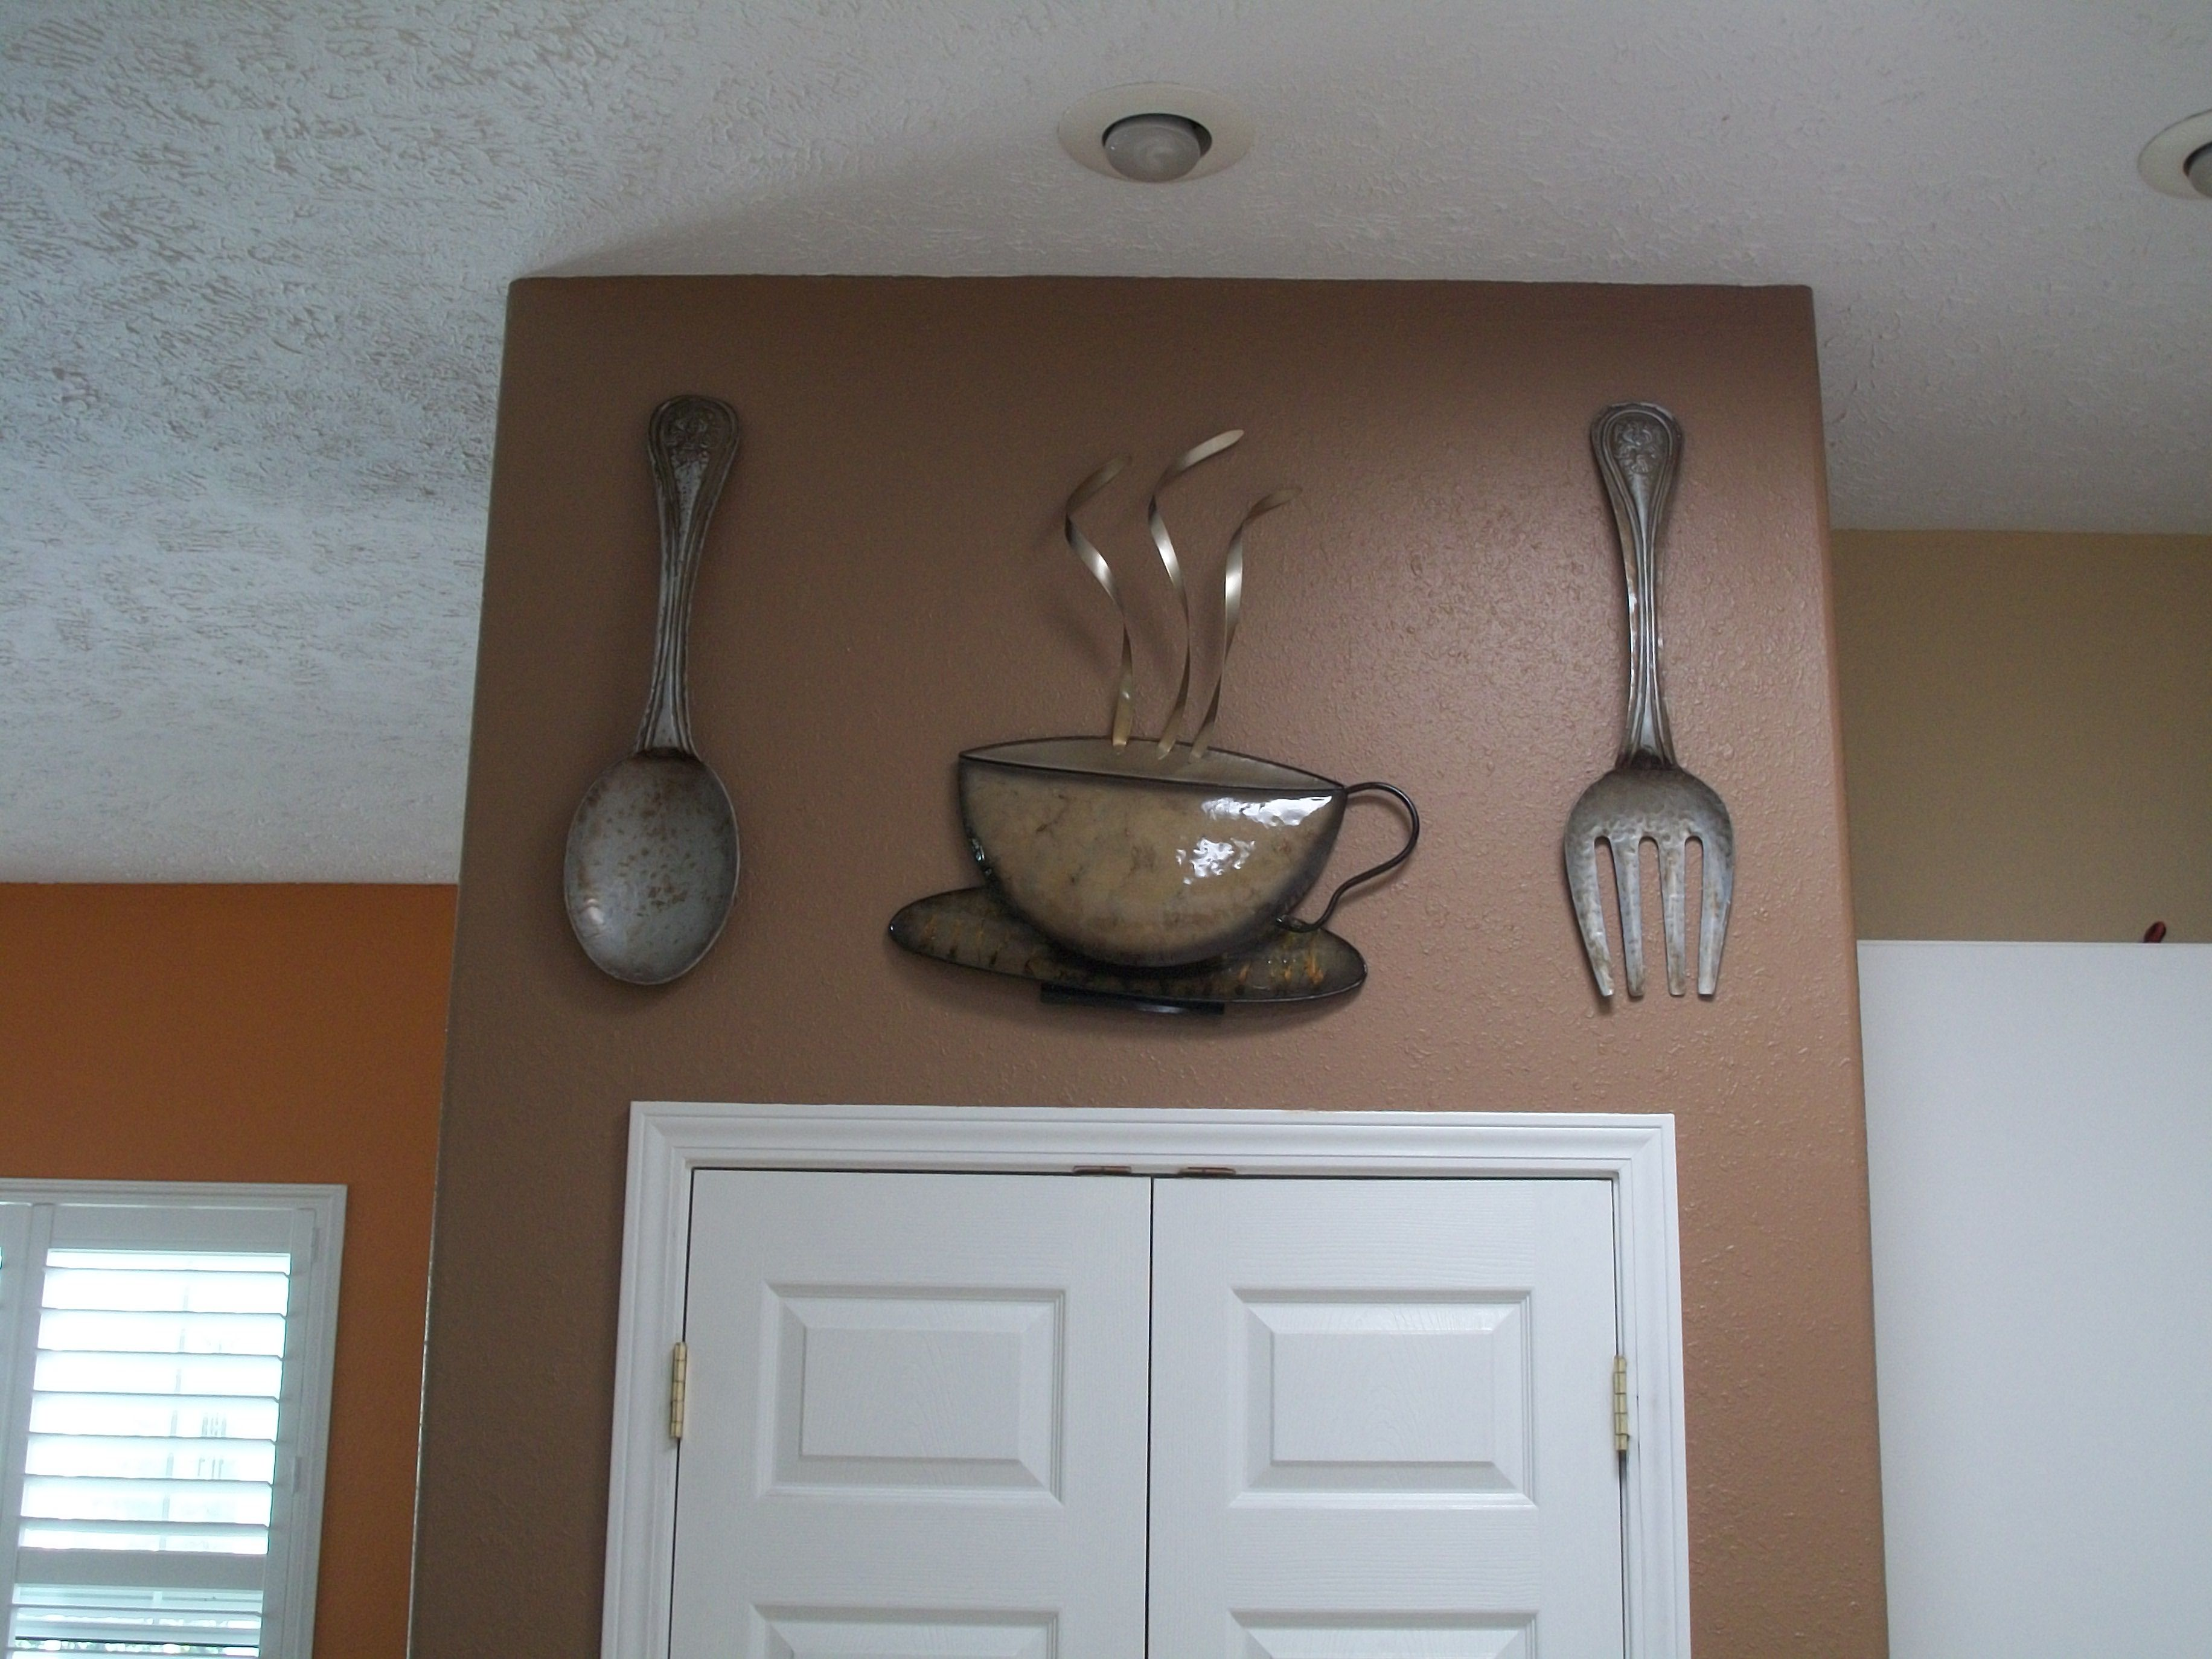 Kitchen decor. Got these cool pieces at Kirklands Home decor